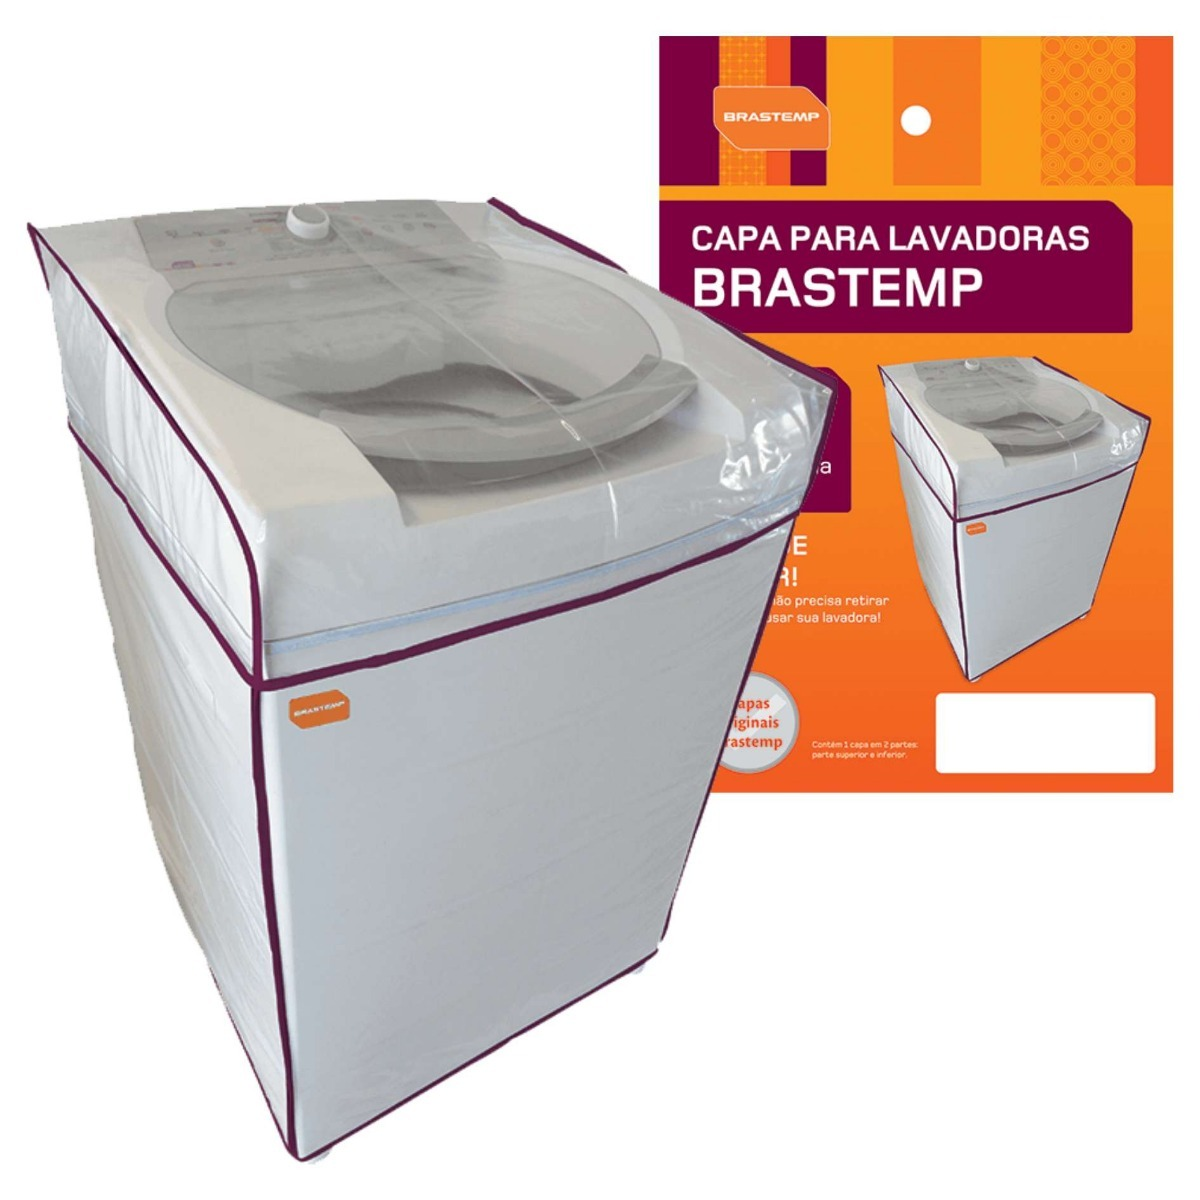 fa035514a capa maquina lavadora brastemp clean ative bwl09 bwb08 bwc08. Carregando  zoom.